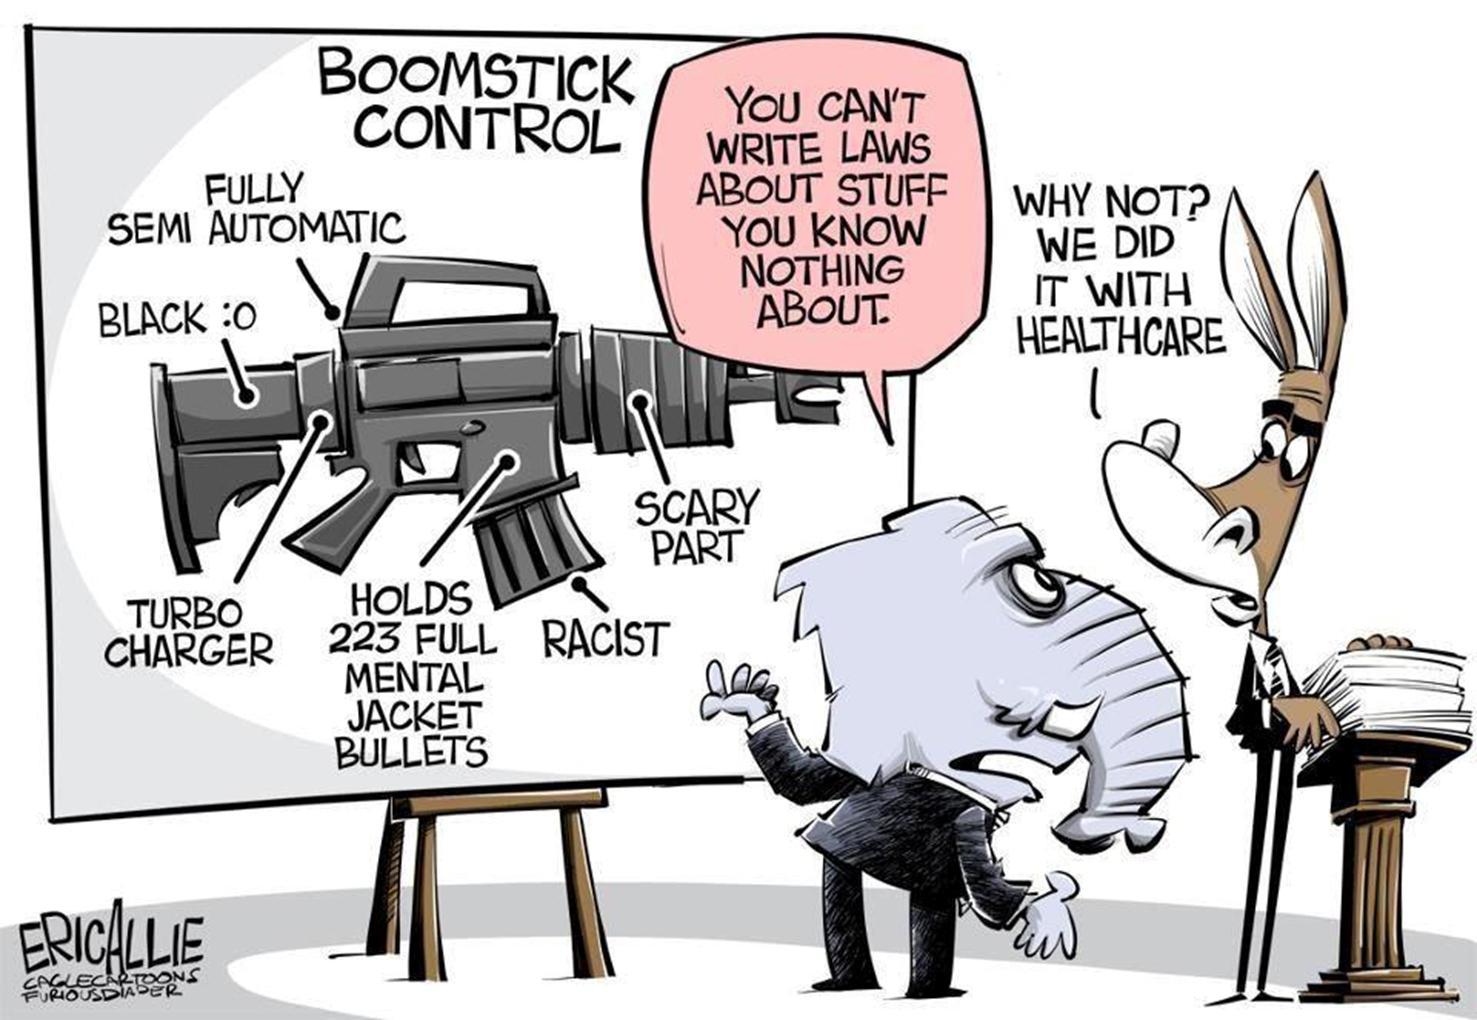 FUN:  Favorite cartoon images about gun control-gun-control-cartoon.jpg